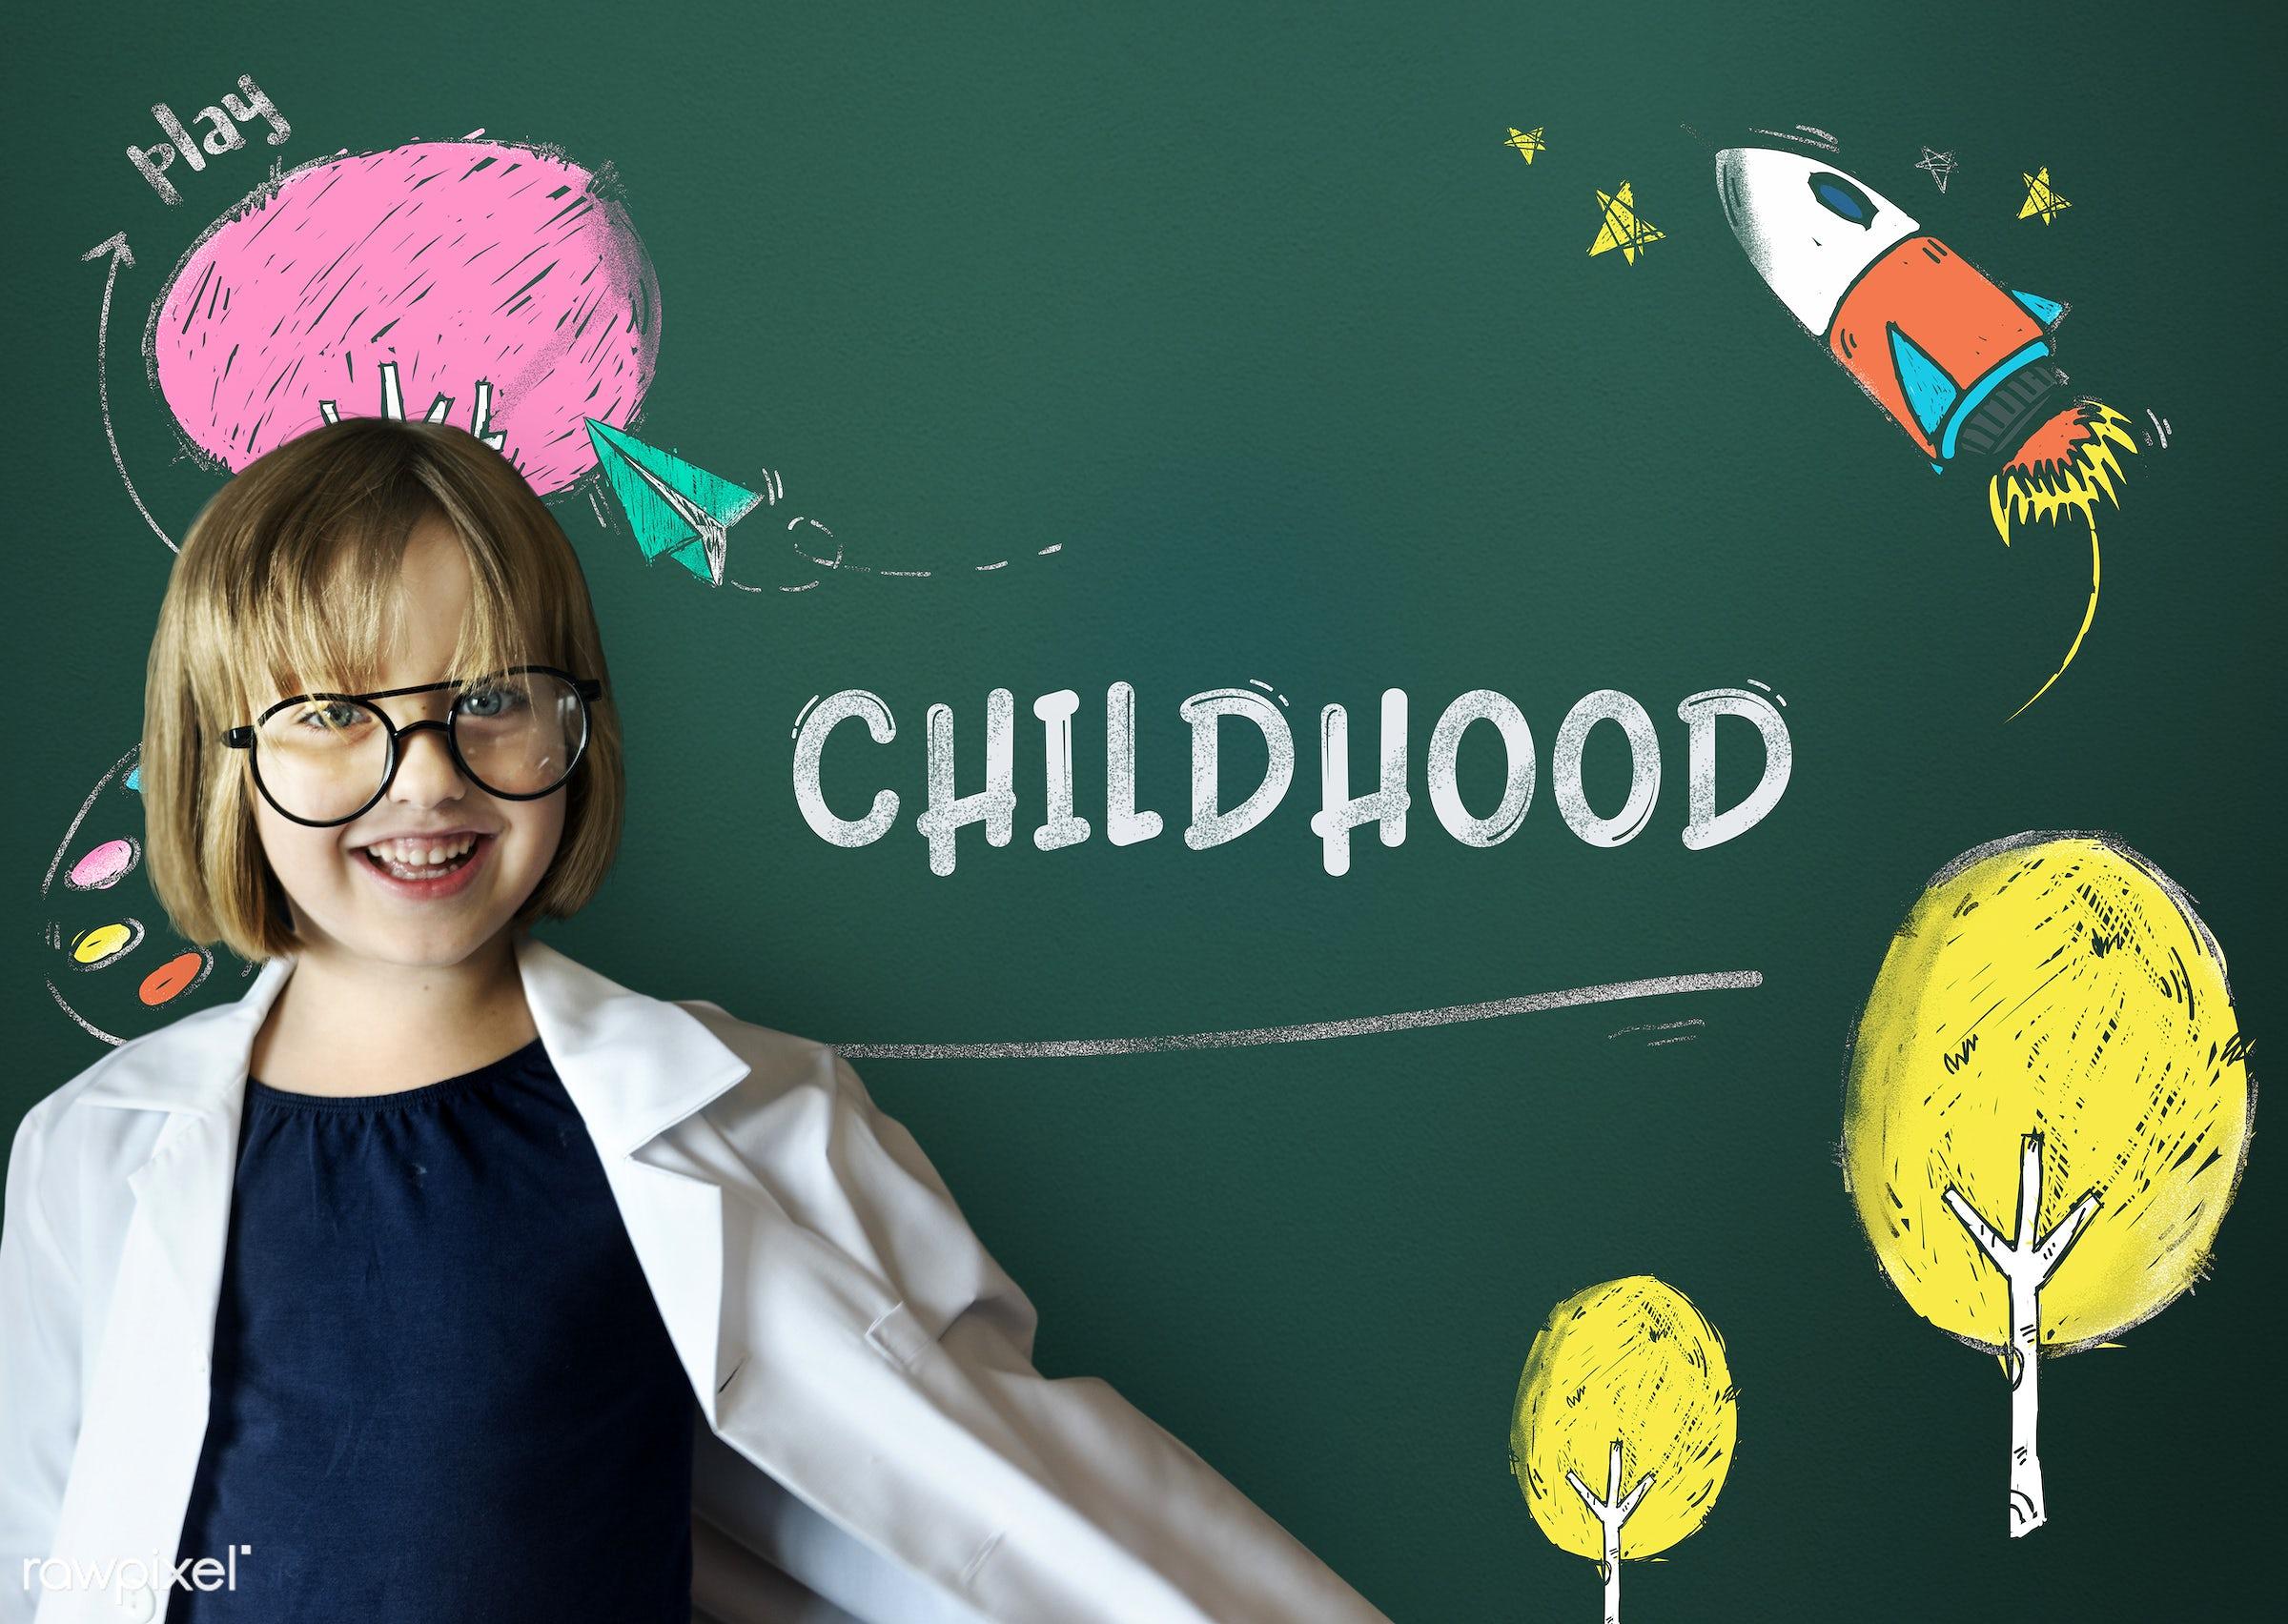 adolescence, adorable, blackboard, boys, cheerful, child, childhood, children, creative, cute, drawing, dream job, early...